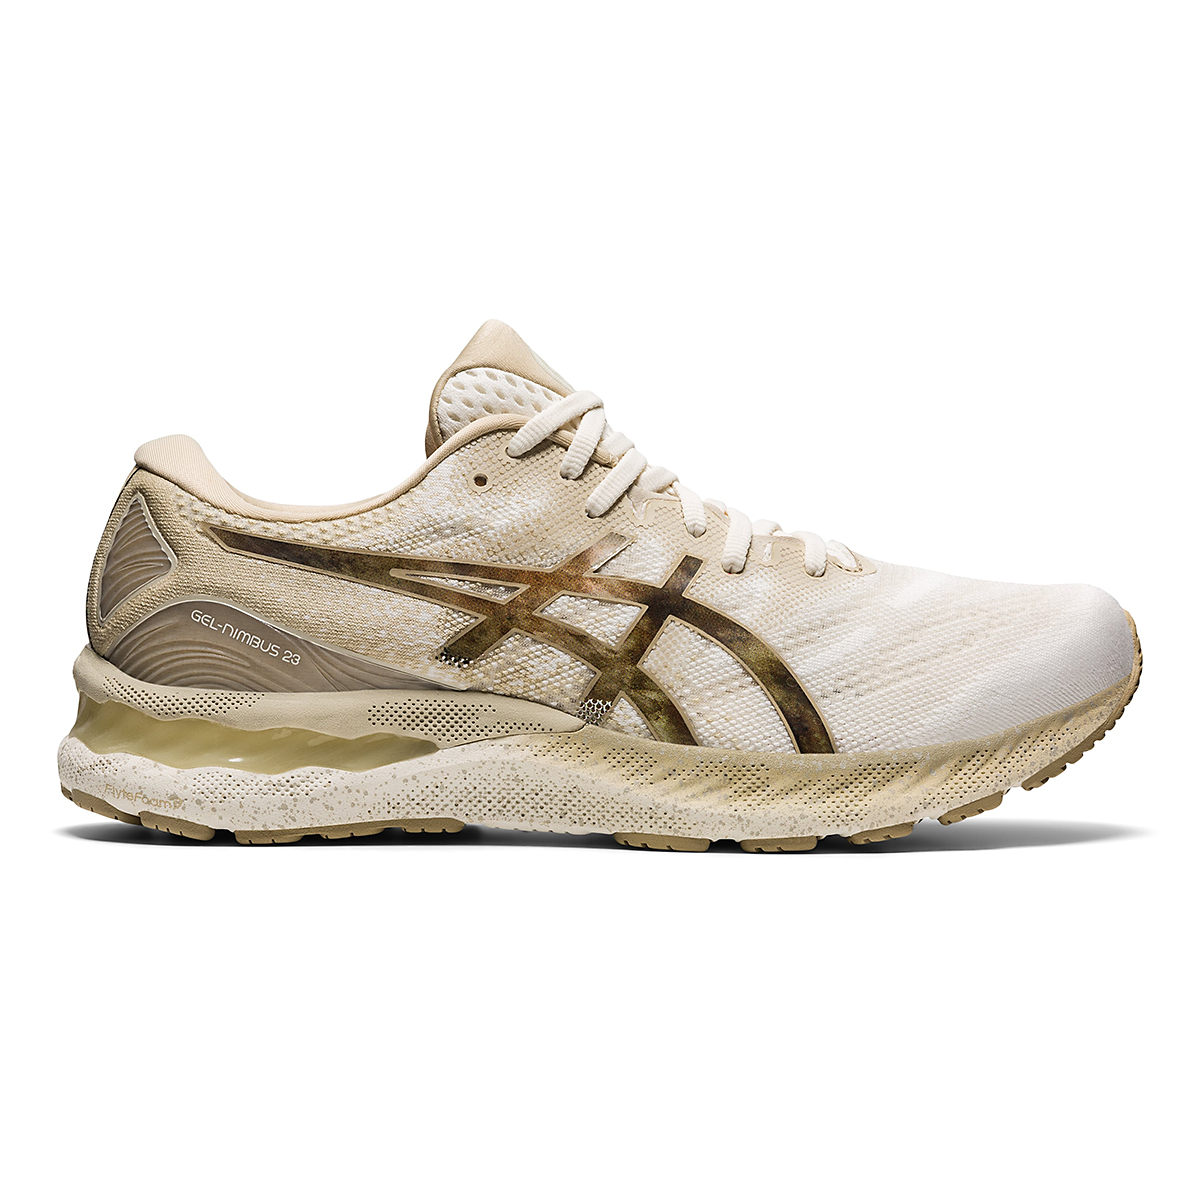 Men's Asics Gel-Nimbus 23 Earth Day Running Shoe - Color: Cream/Putty - Size: 7 - Width: Regular, Cream/Putty, large, image 1